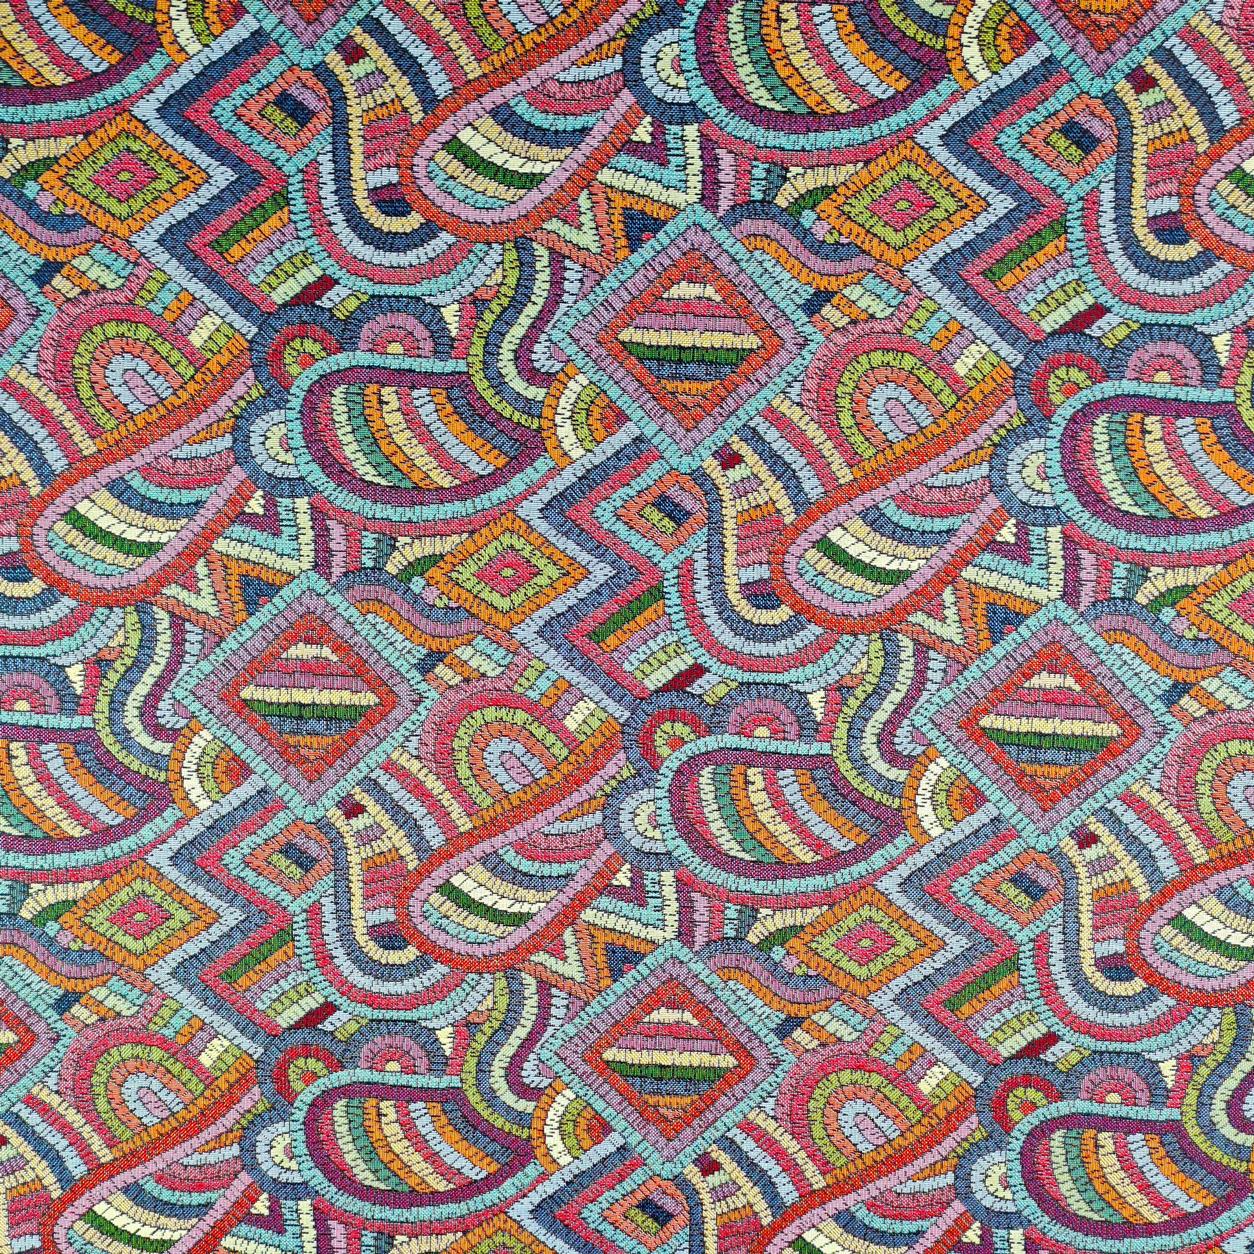 Tessuto Jacquard Fantasia Astratta Ricamo Mosaico Multicolor